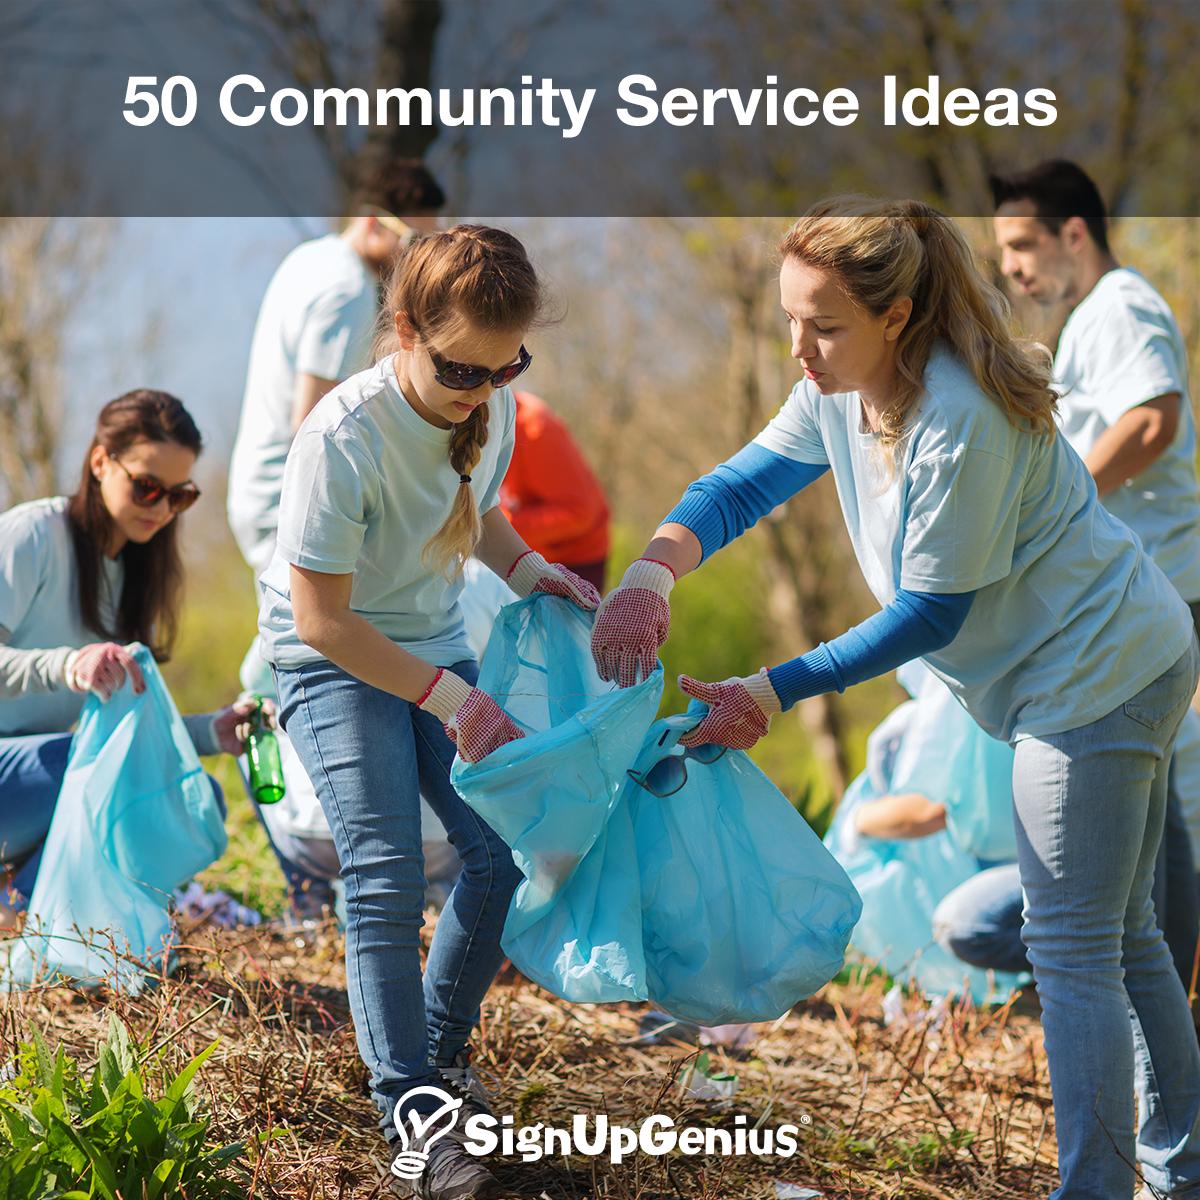 50 Community Service Ideas